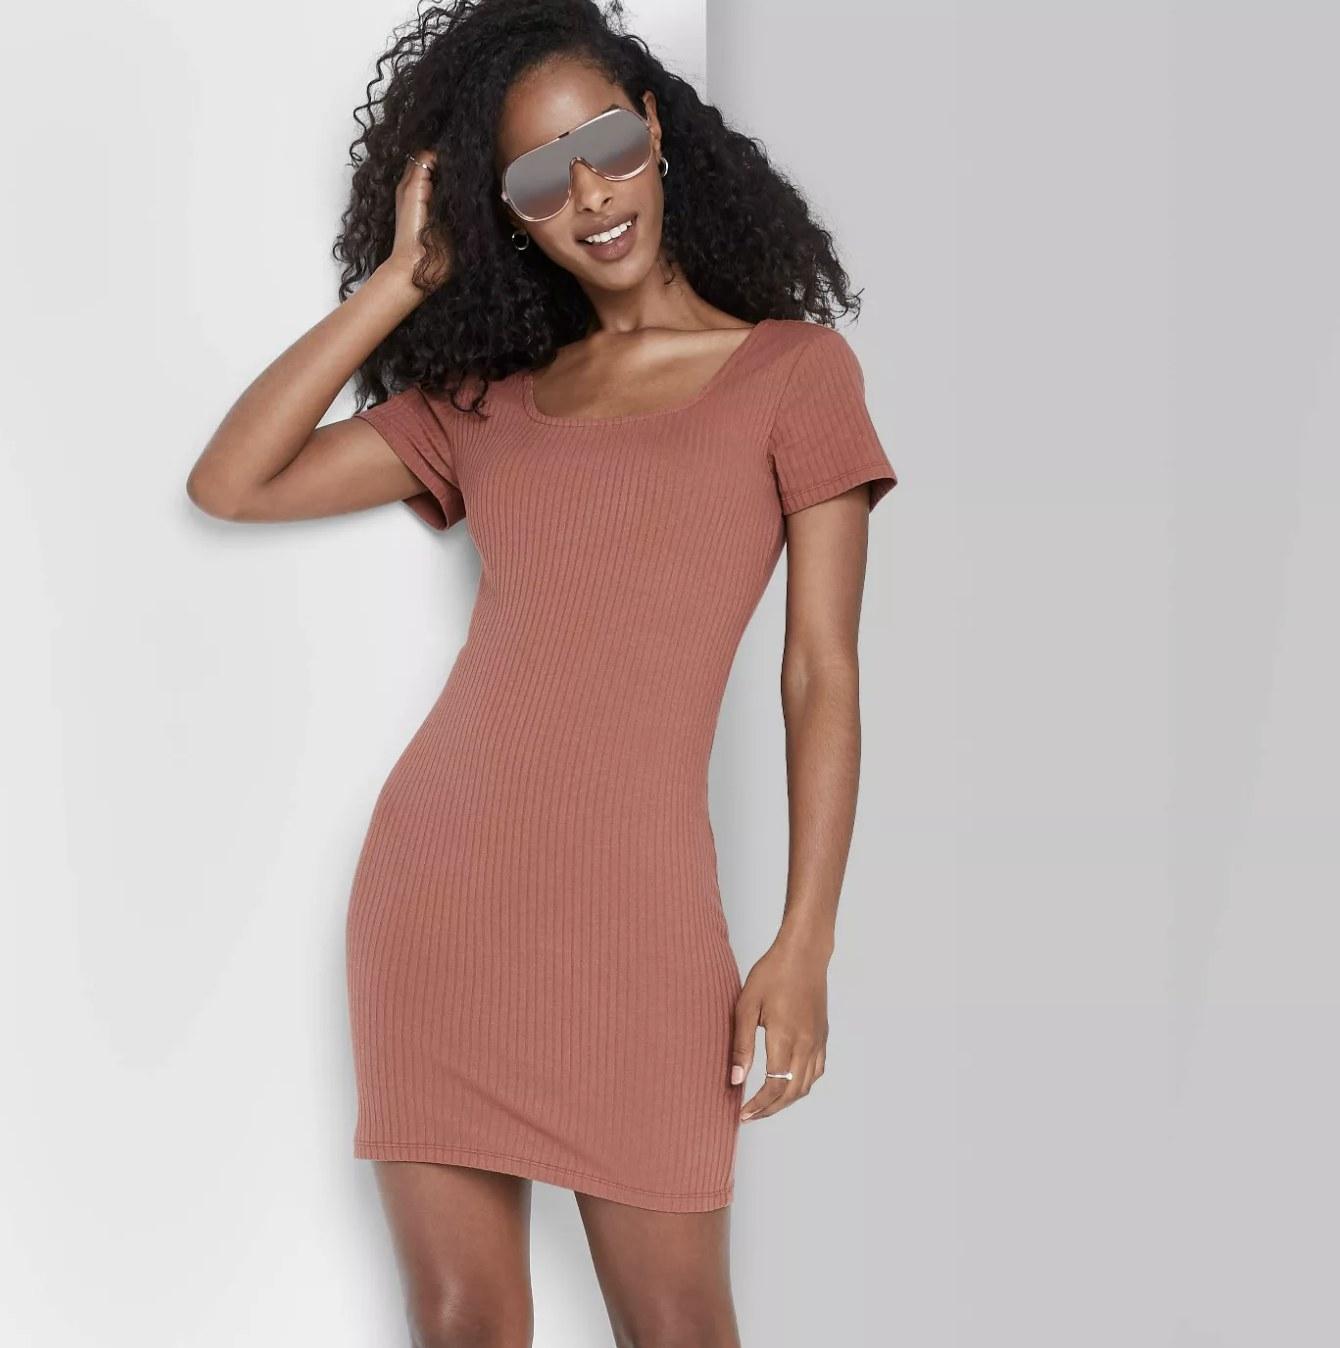 Model is wearing a blush pink short-sleeve knit dress